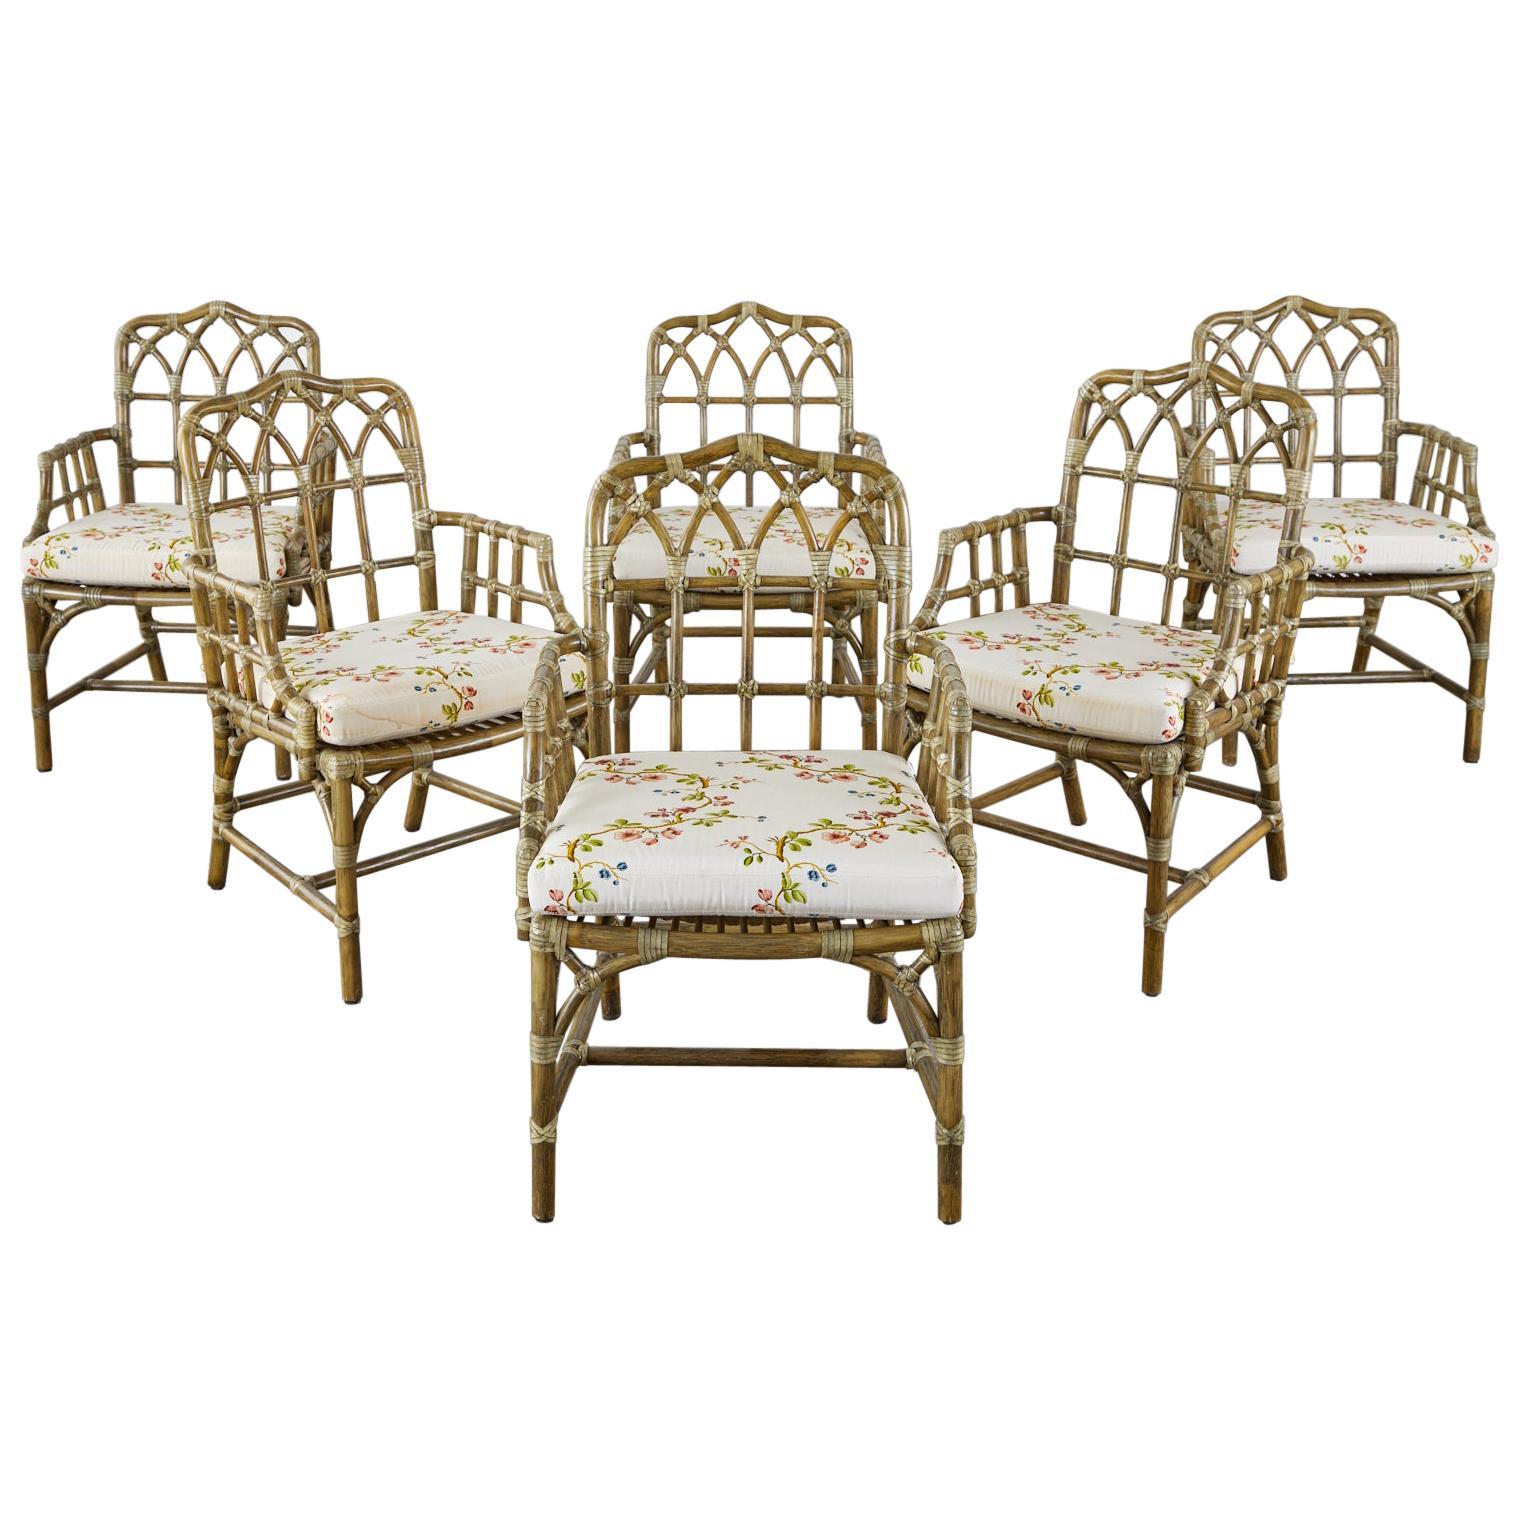 Bob Hope's Set of Six McGuire Rattan Dining Armchairs